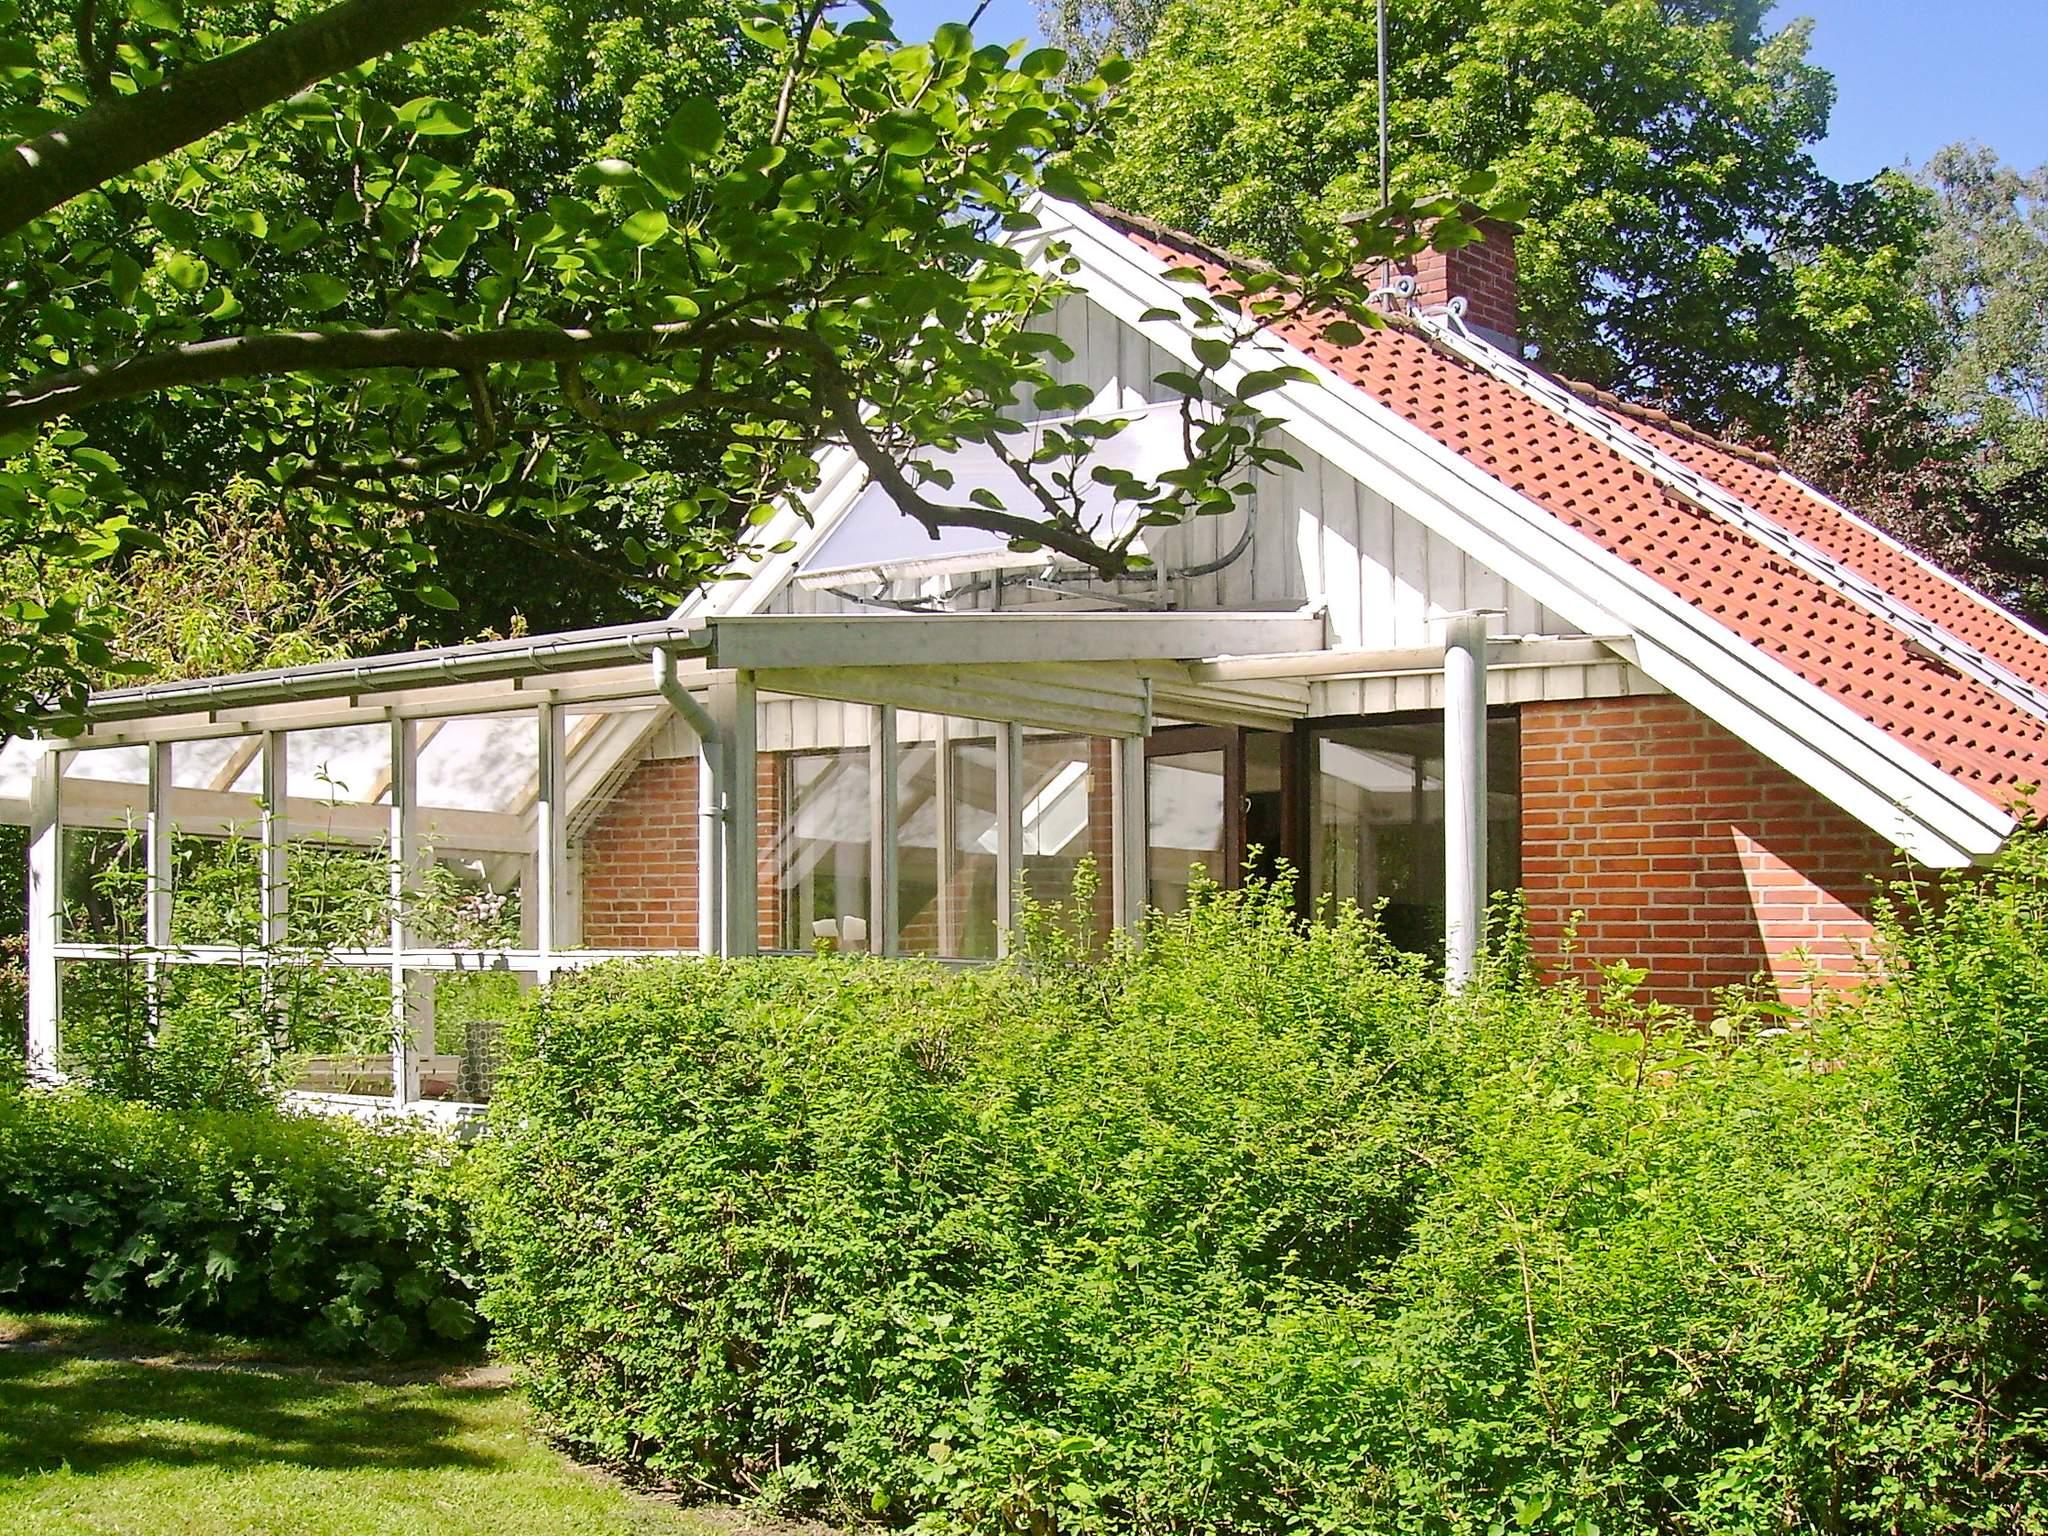 Ferienhaus Smidstrup Strand (135755), Smidstrup, , Nordseeland, Dänemark, Bild 1